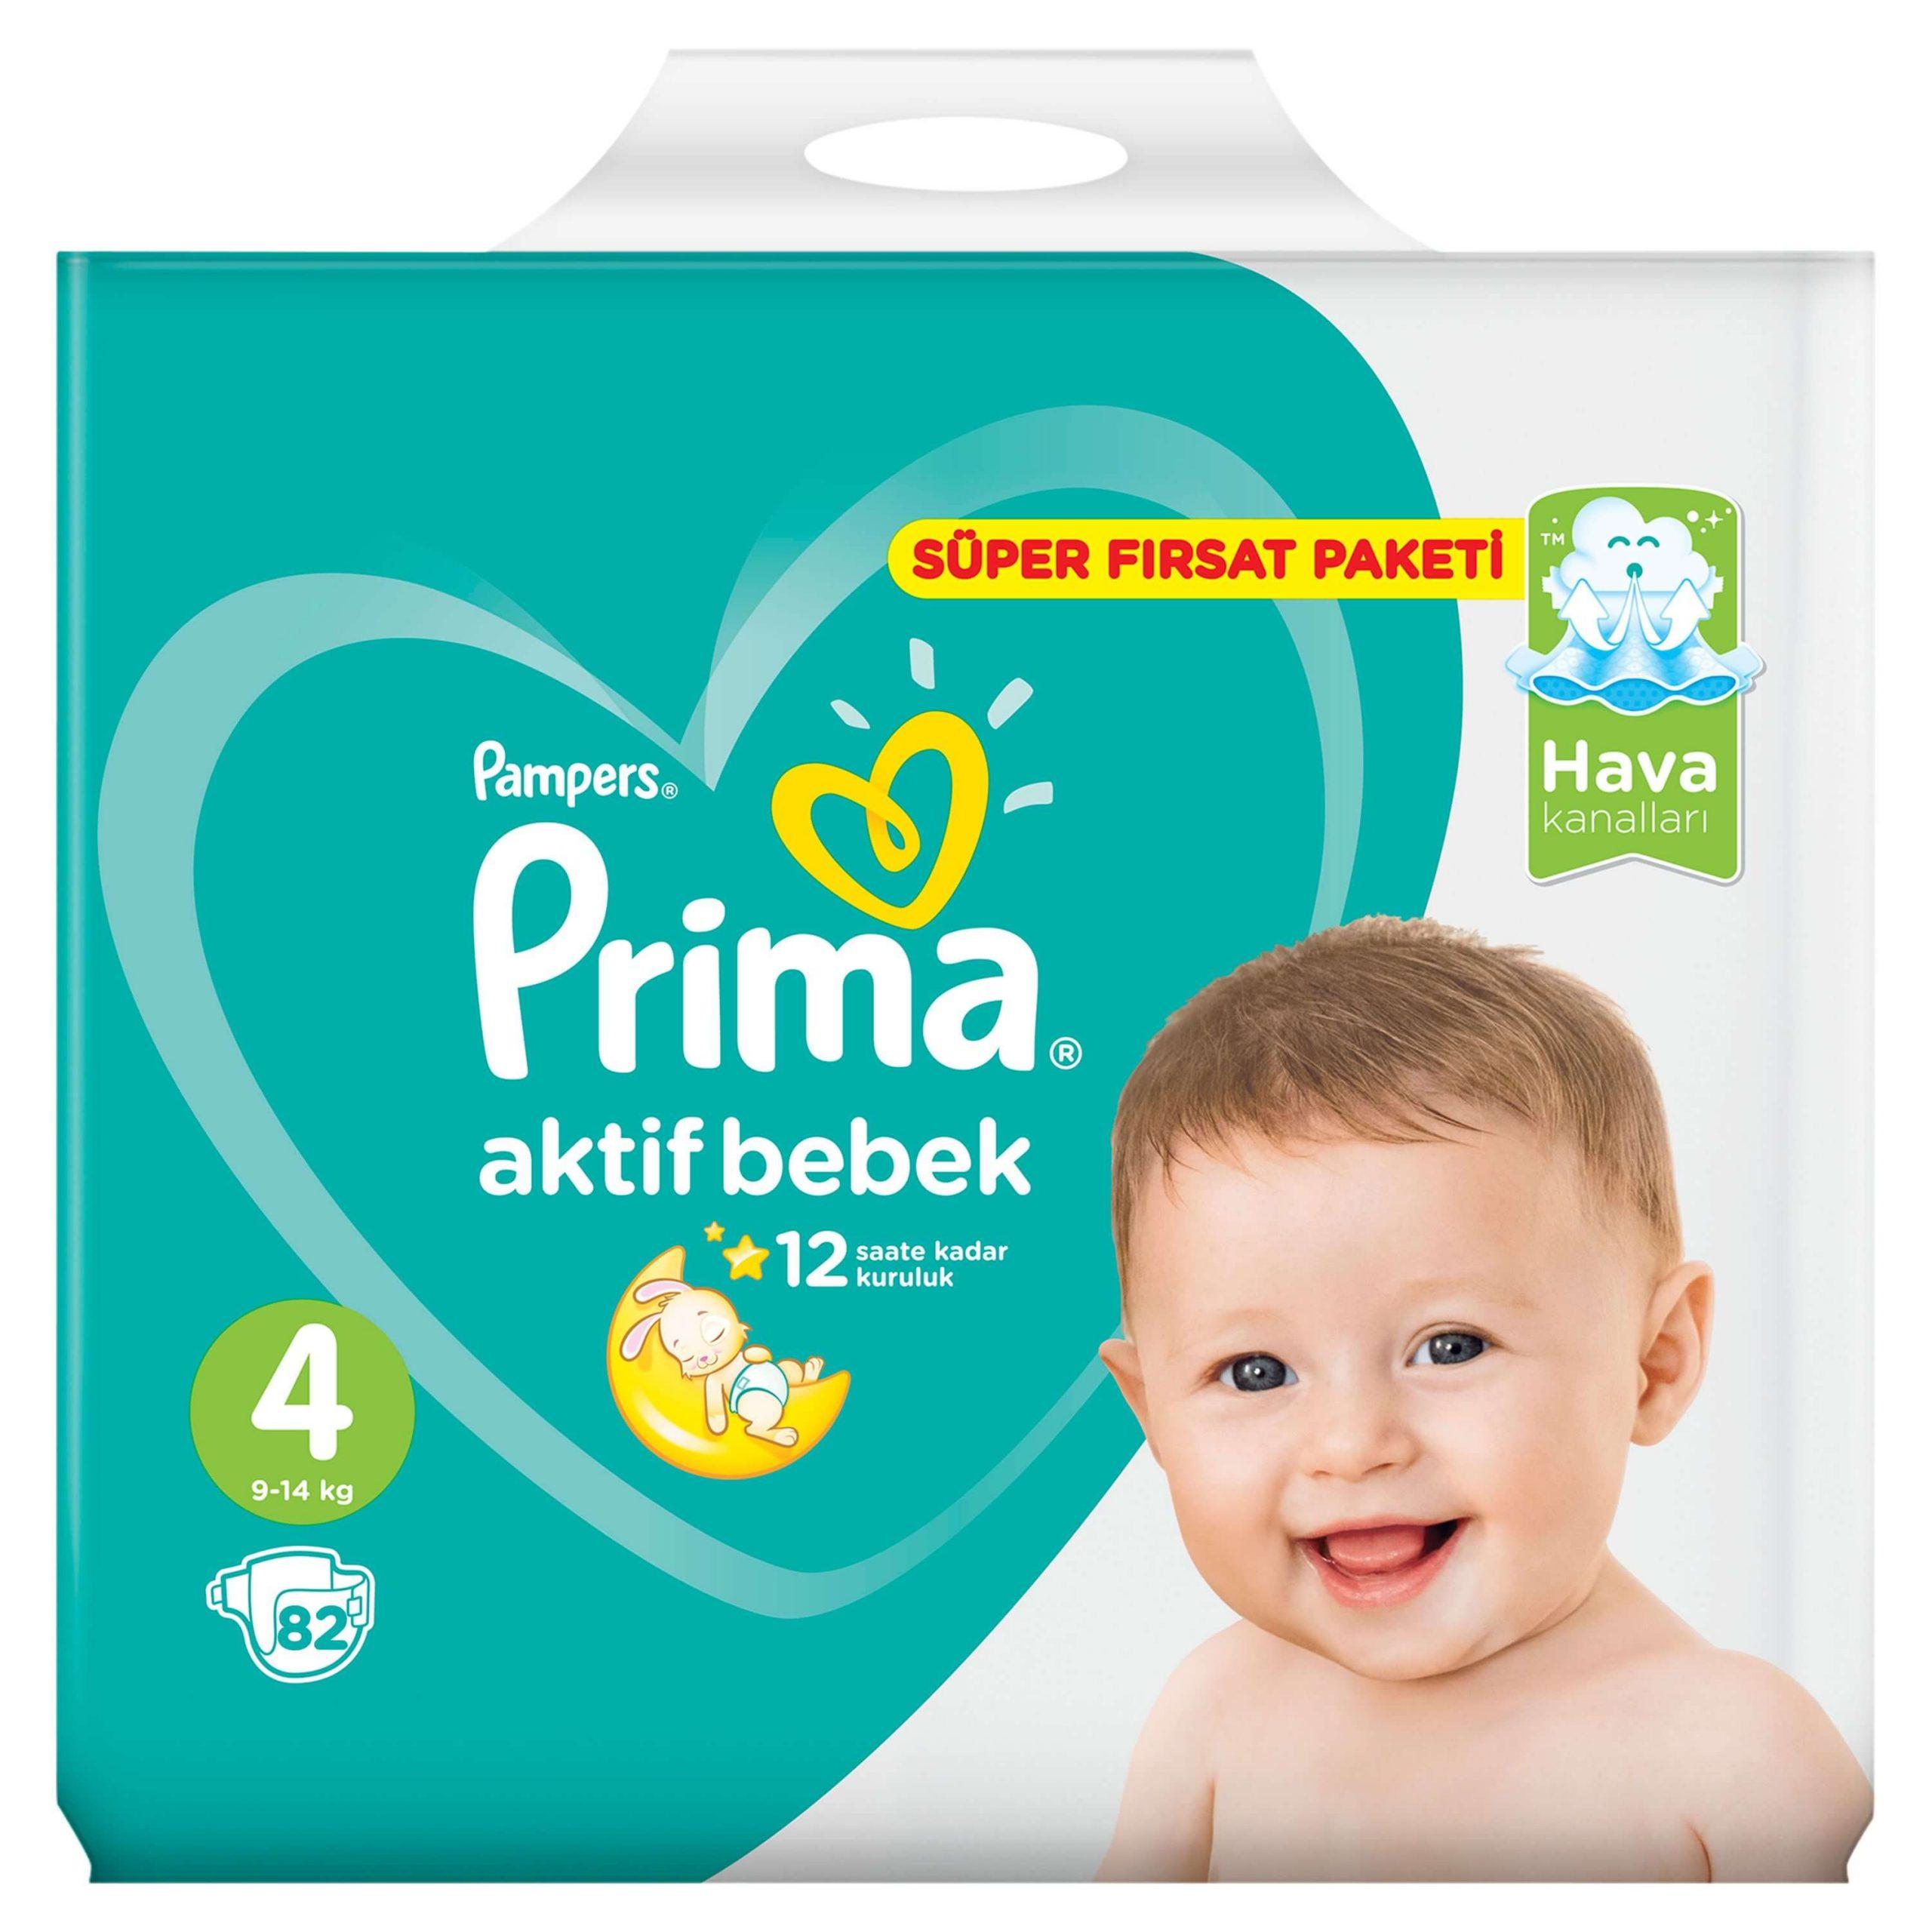 prima-aktif-bebek-4-82-scaled